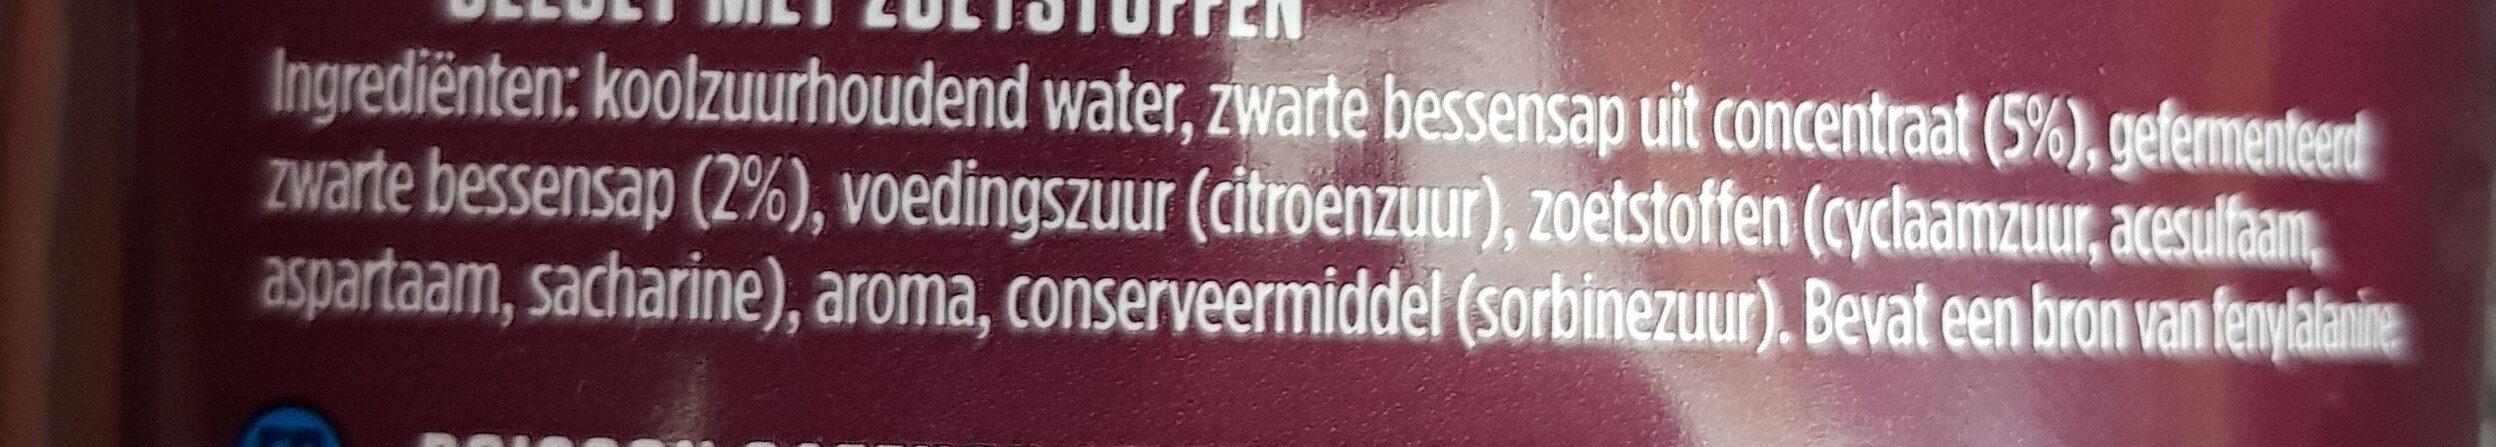 Hero Cassis Zero - Ingrediënten - nl